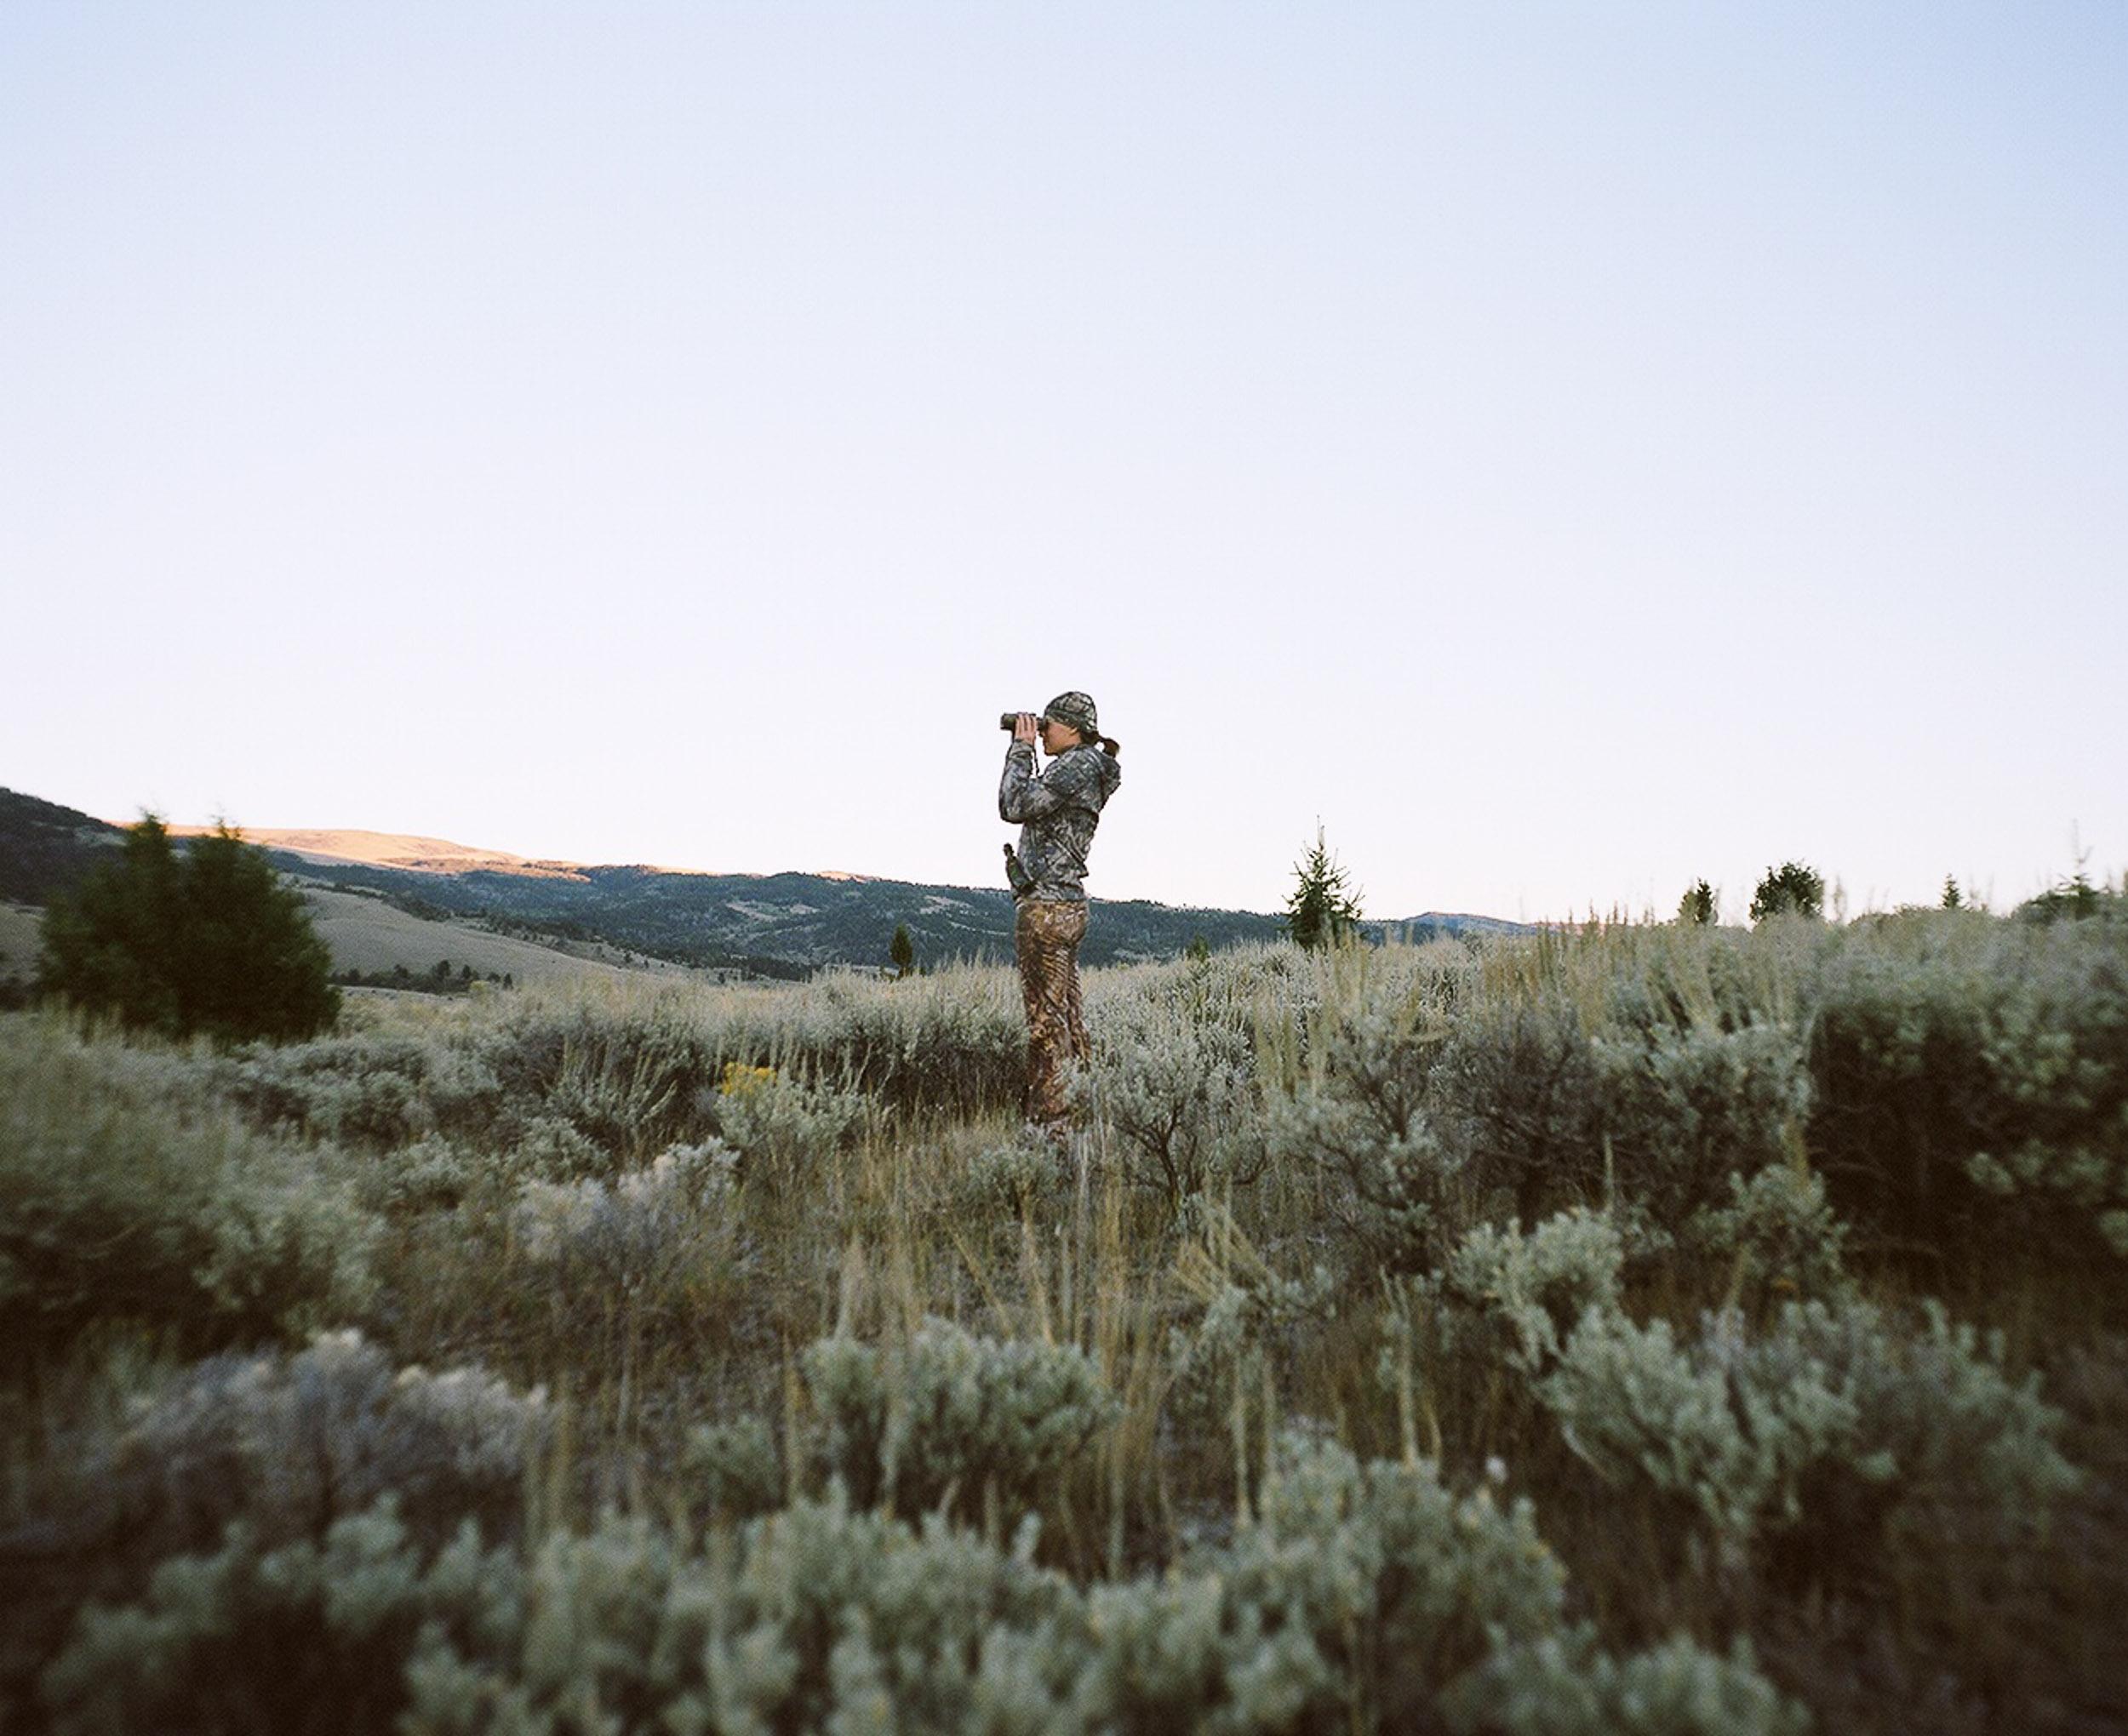 woman hunter looking through binoculars, standing in the sage brush